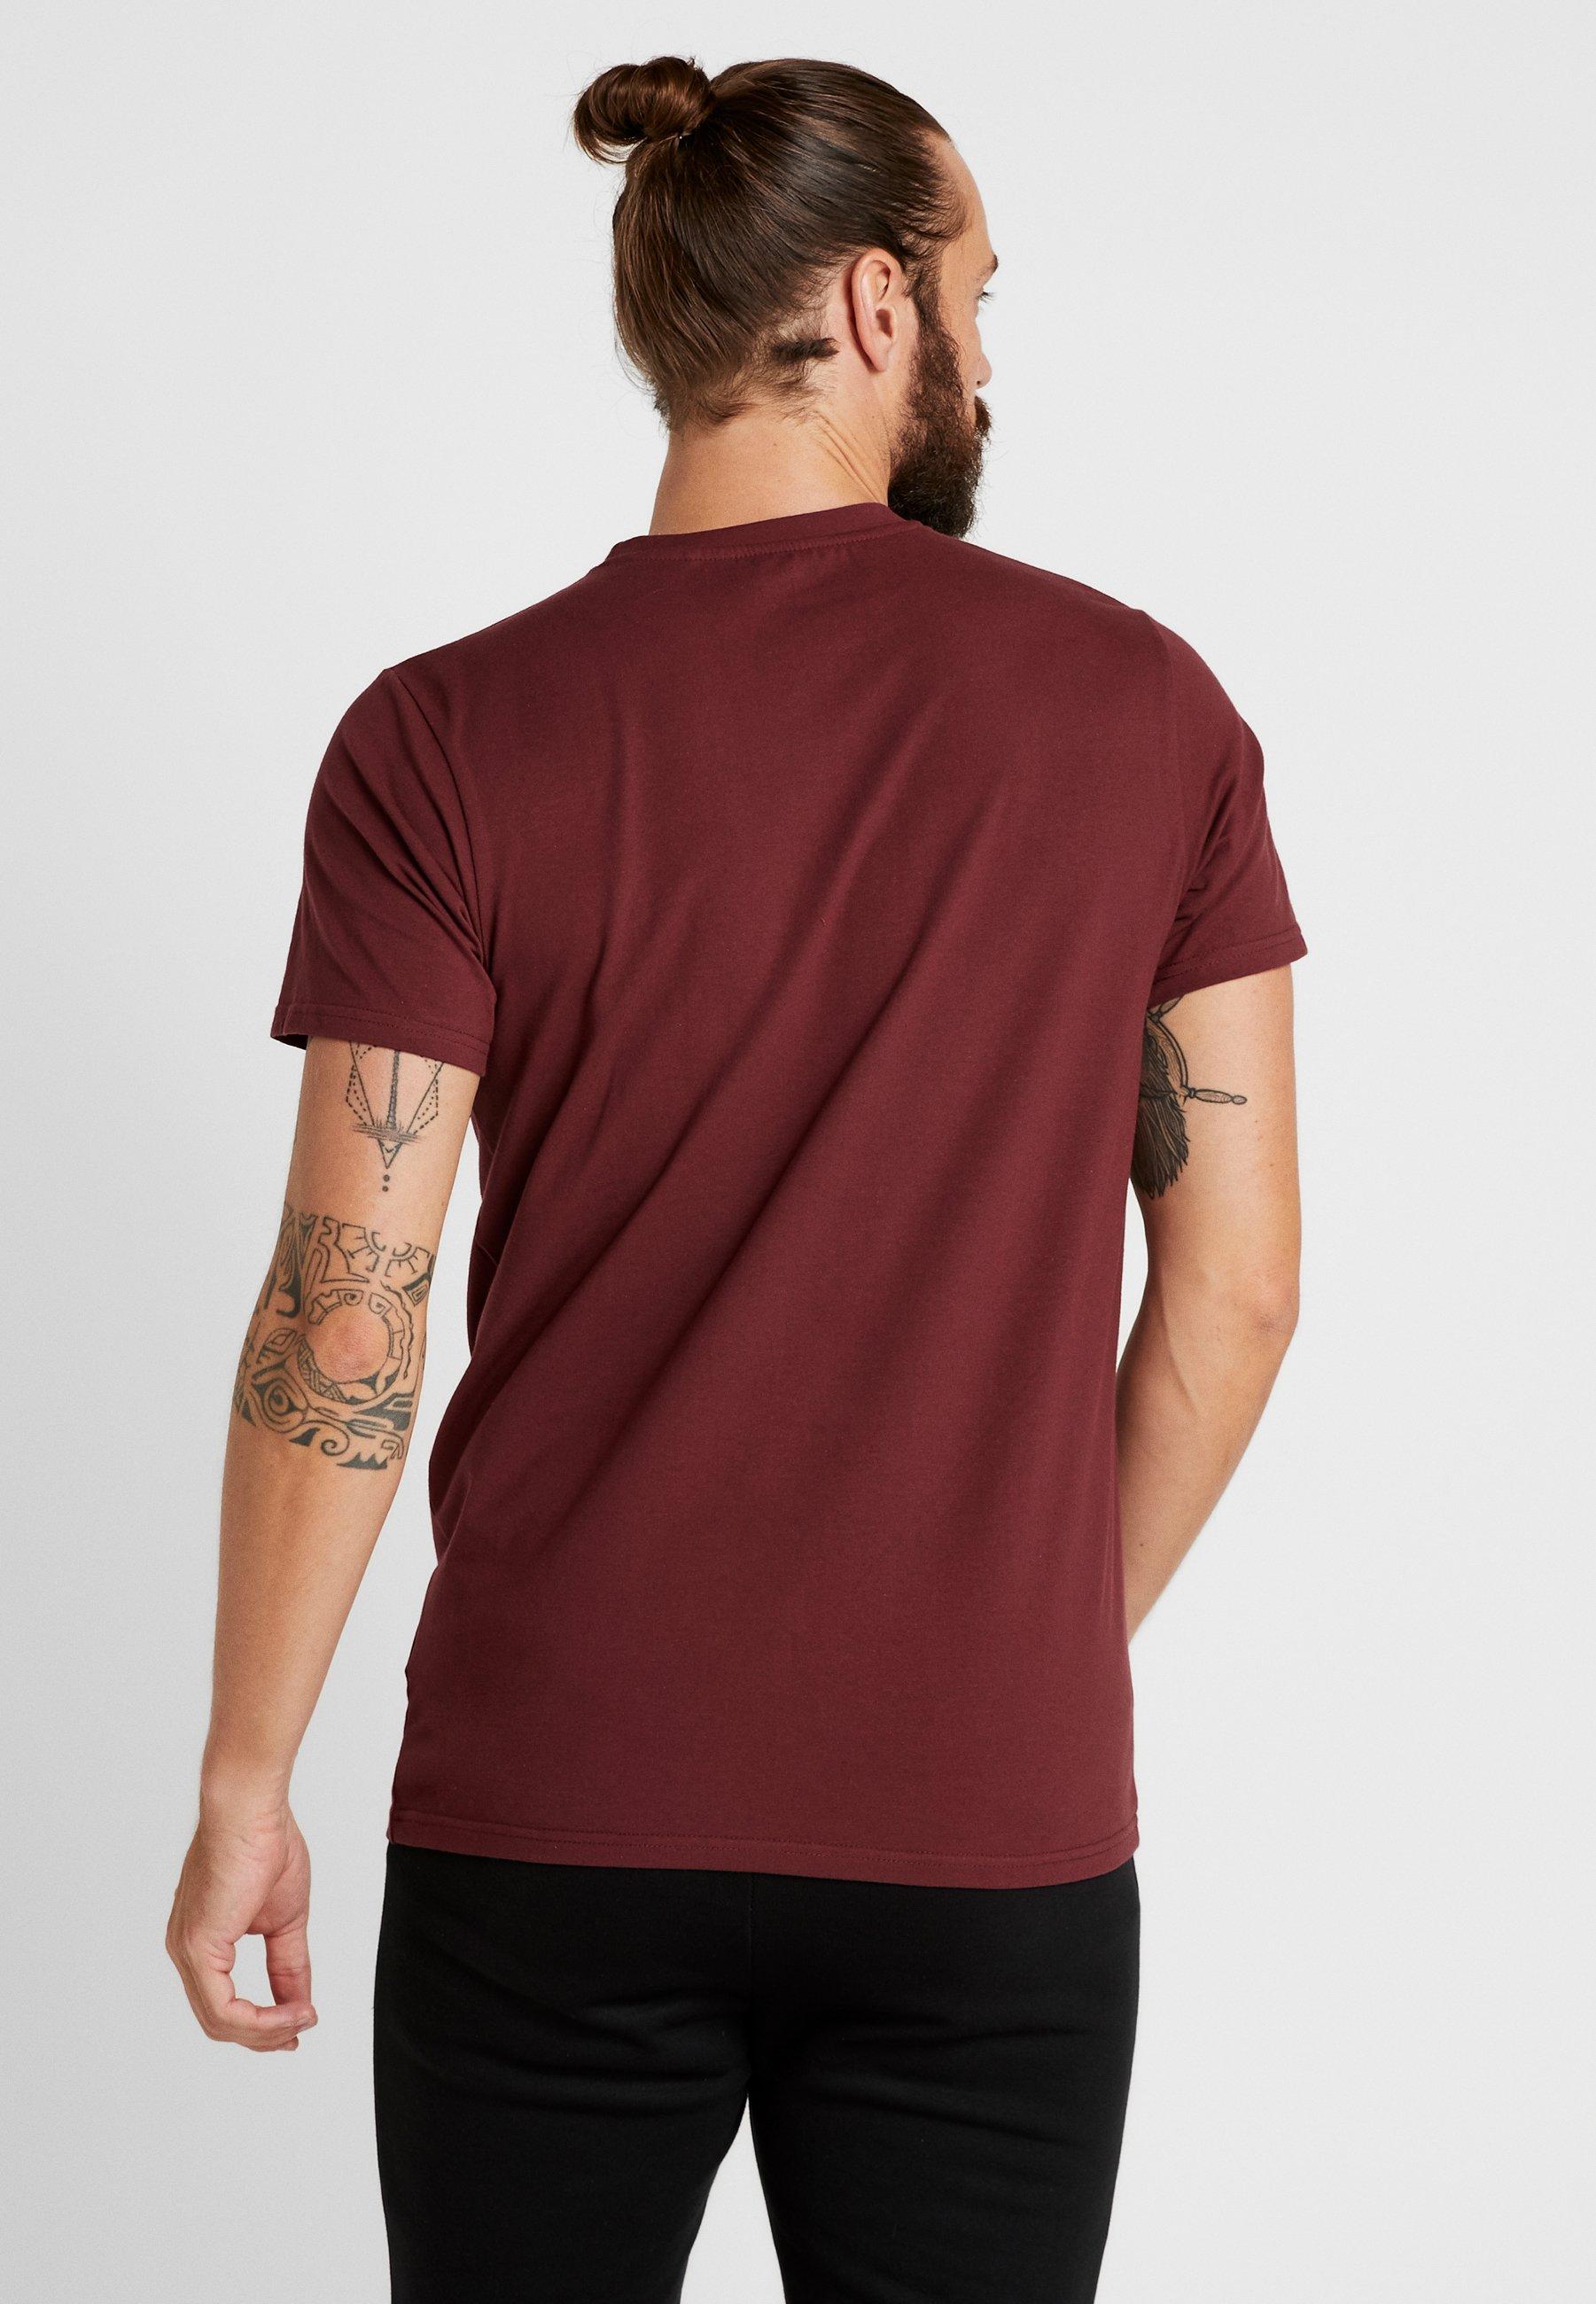 Ellesse GinitiT Ellesse GinitiT shirt shirt Imprimé Ellesse Imprimé Burgundy Burgundy htrdsQC